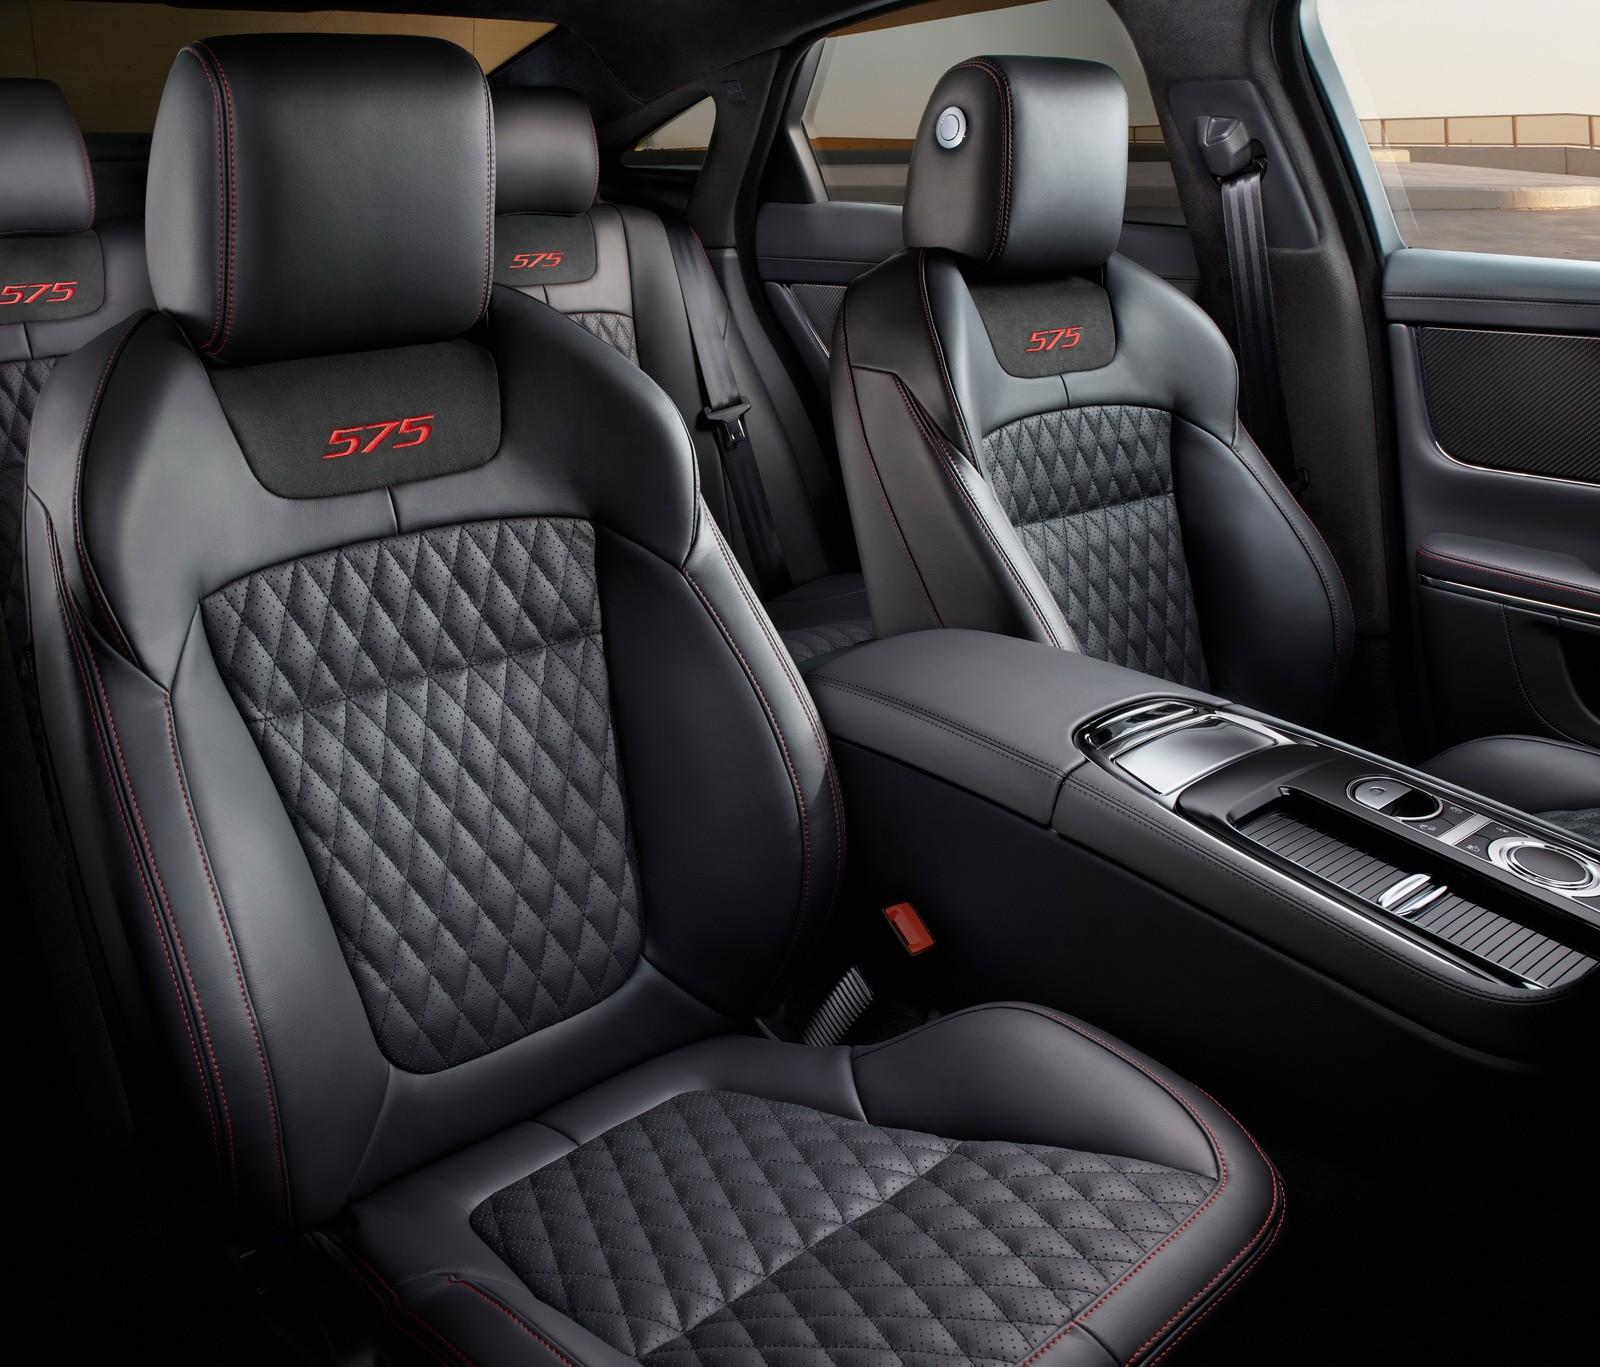 Jaguar Announces Commercial Agreement With The Jockey Club